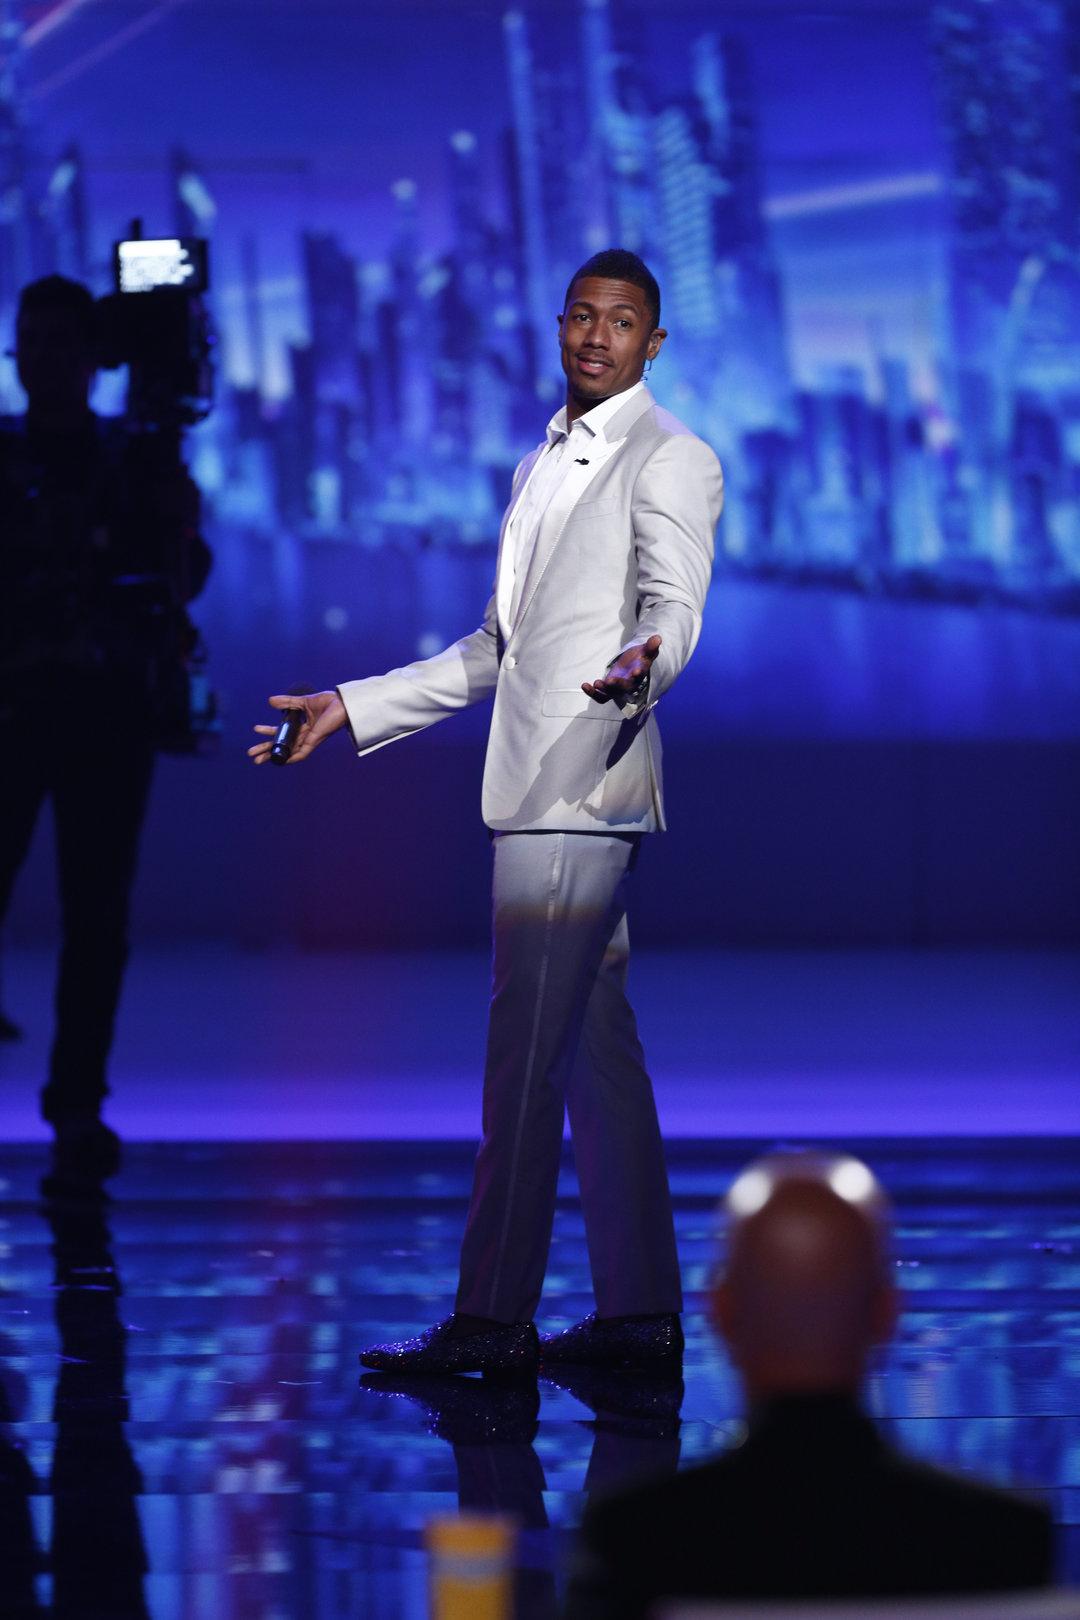 Watch Americas Got Talent Episode: Live Semi Finals 2